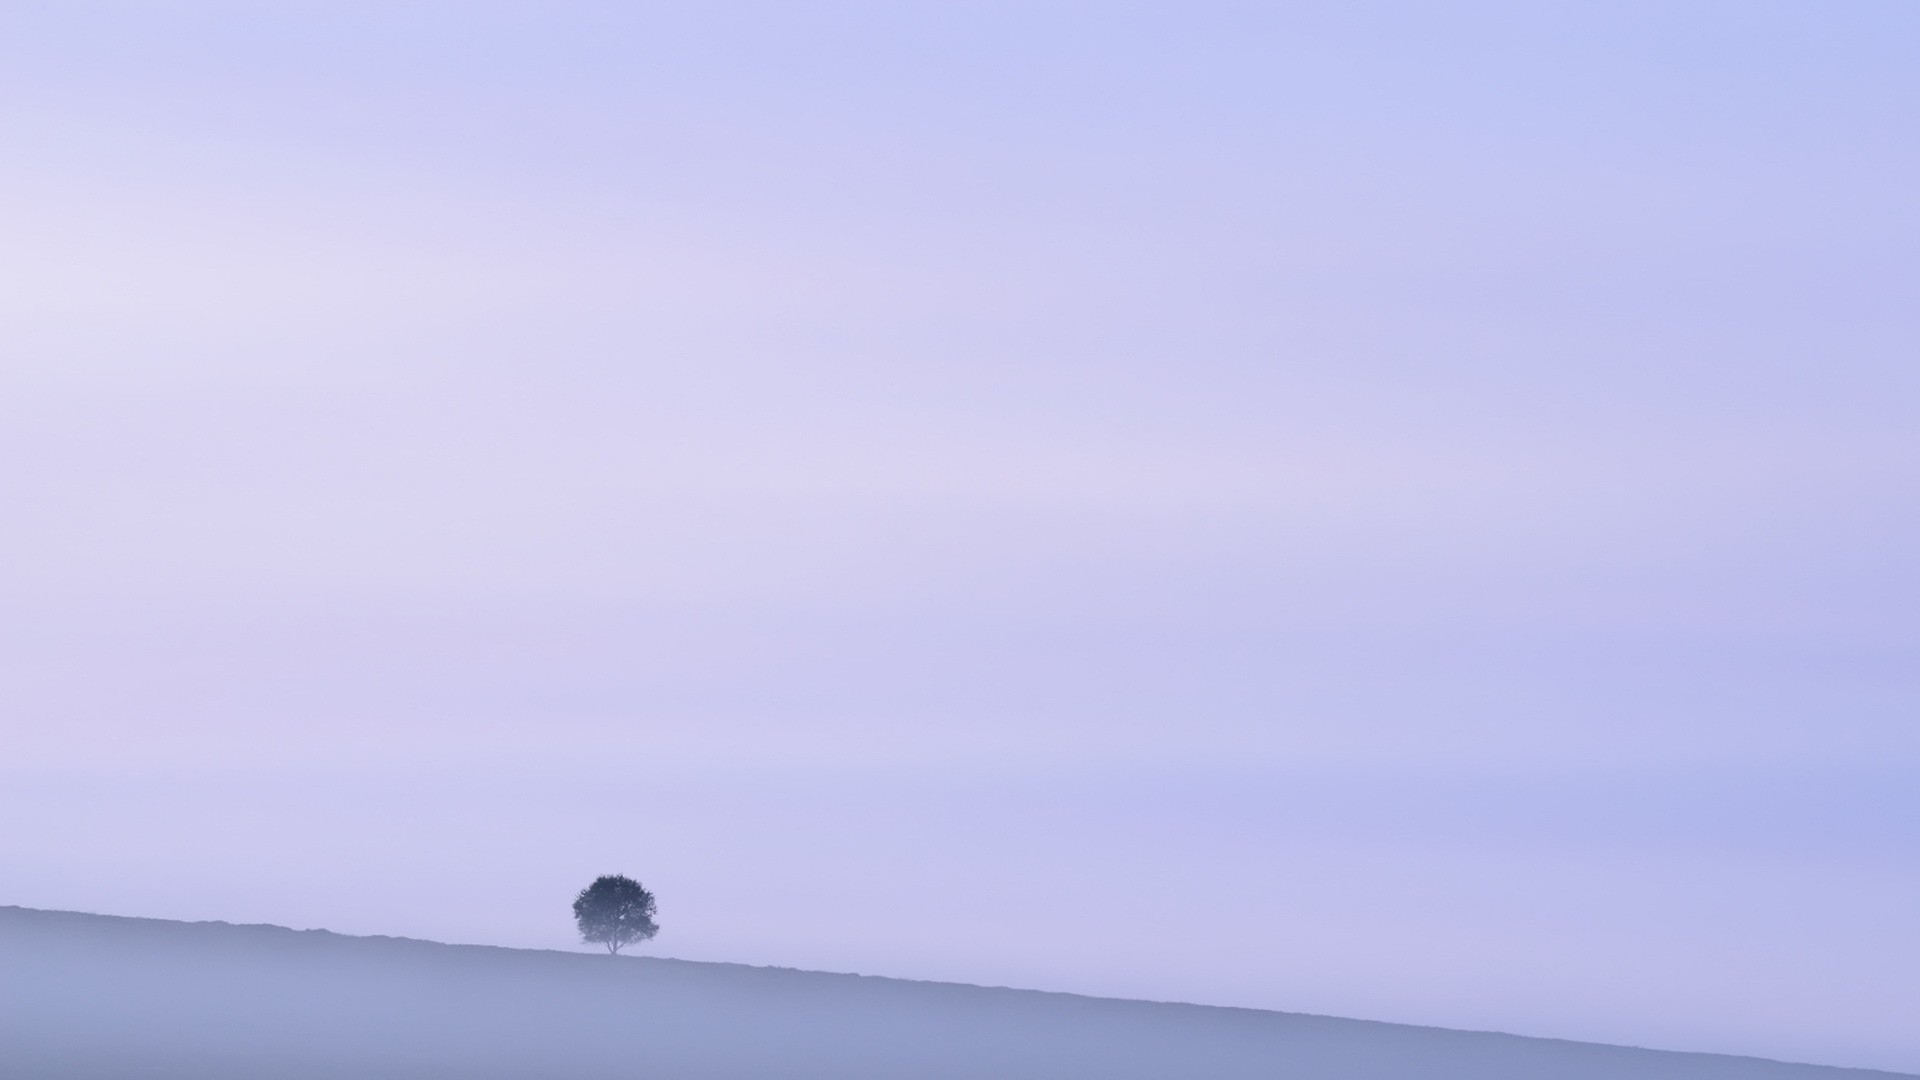 Lonely Trees Minimalist Image